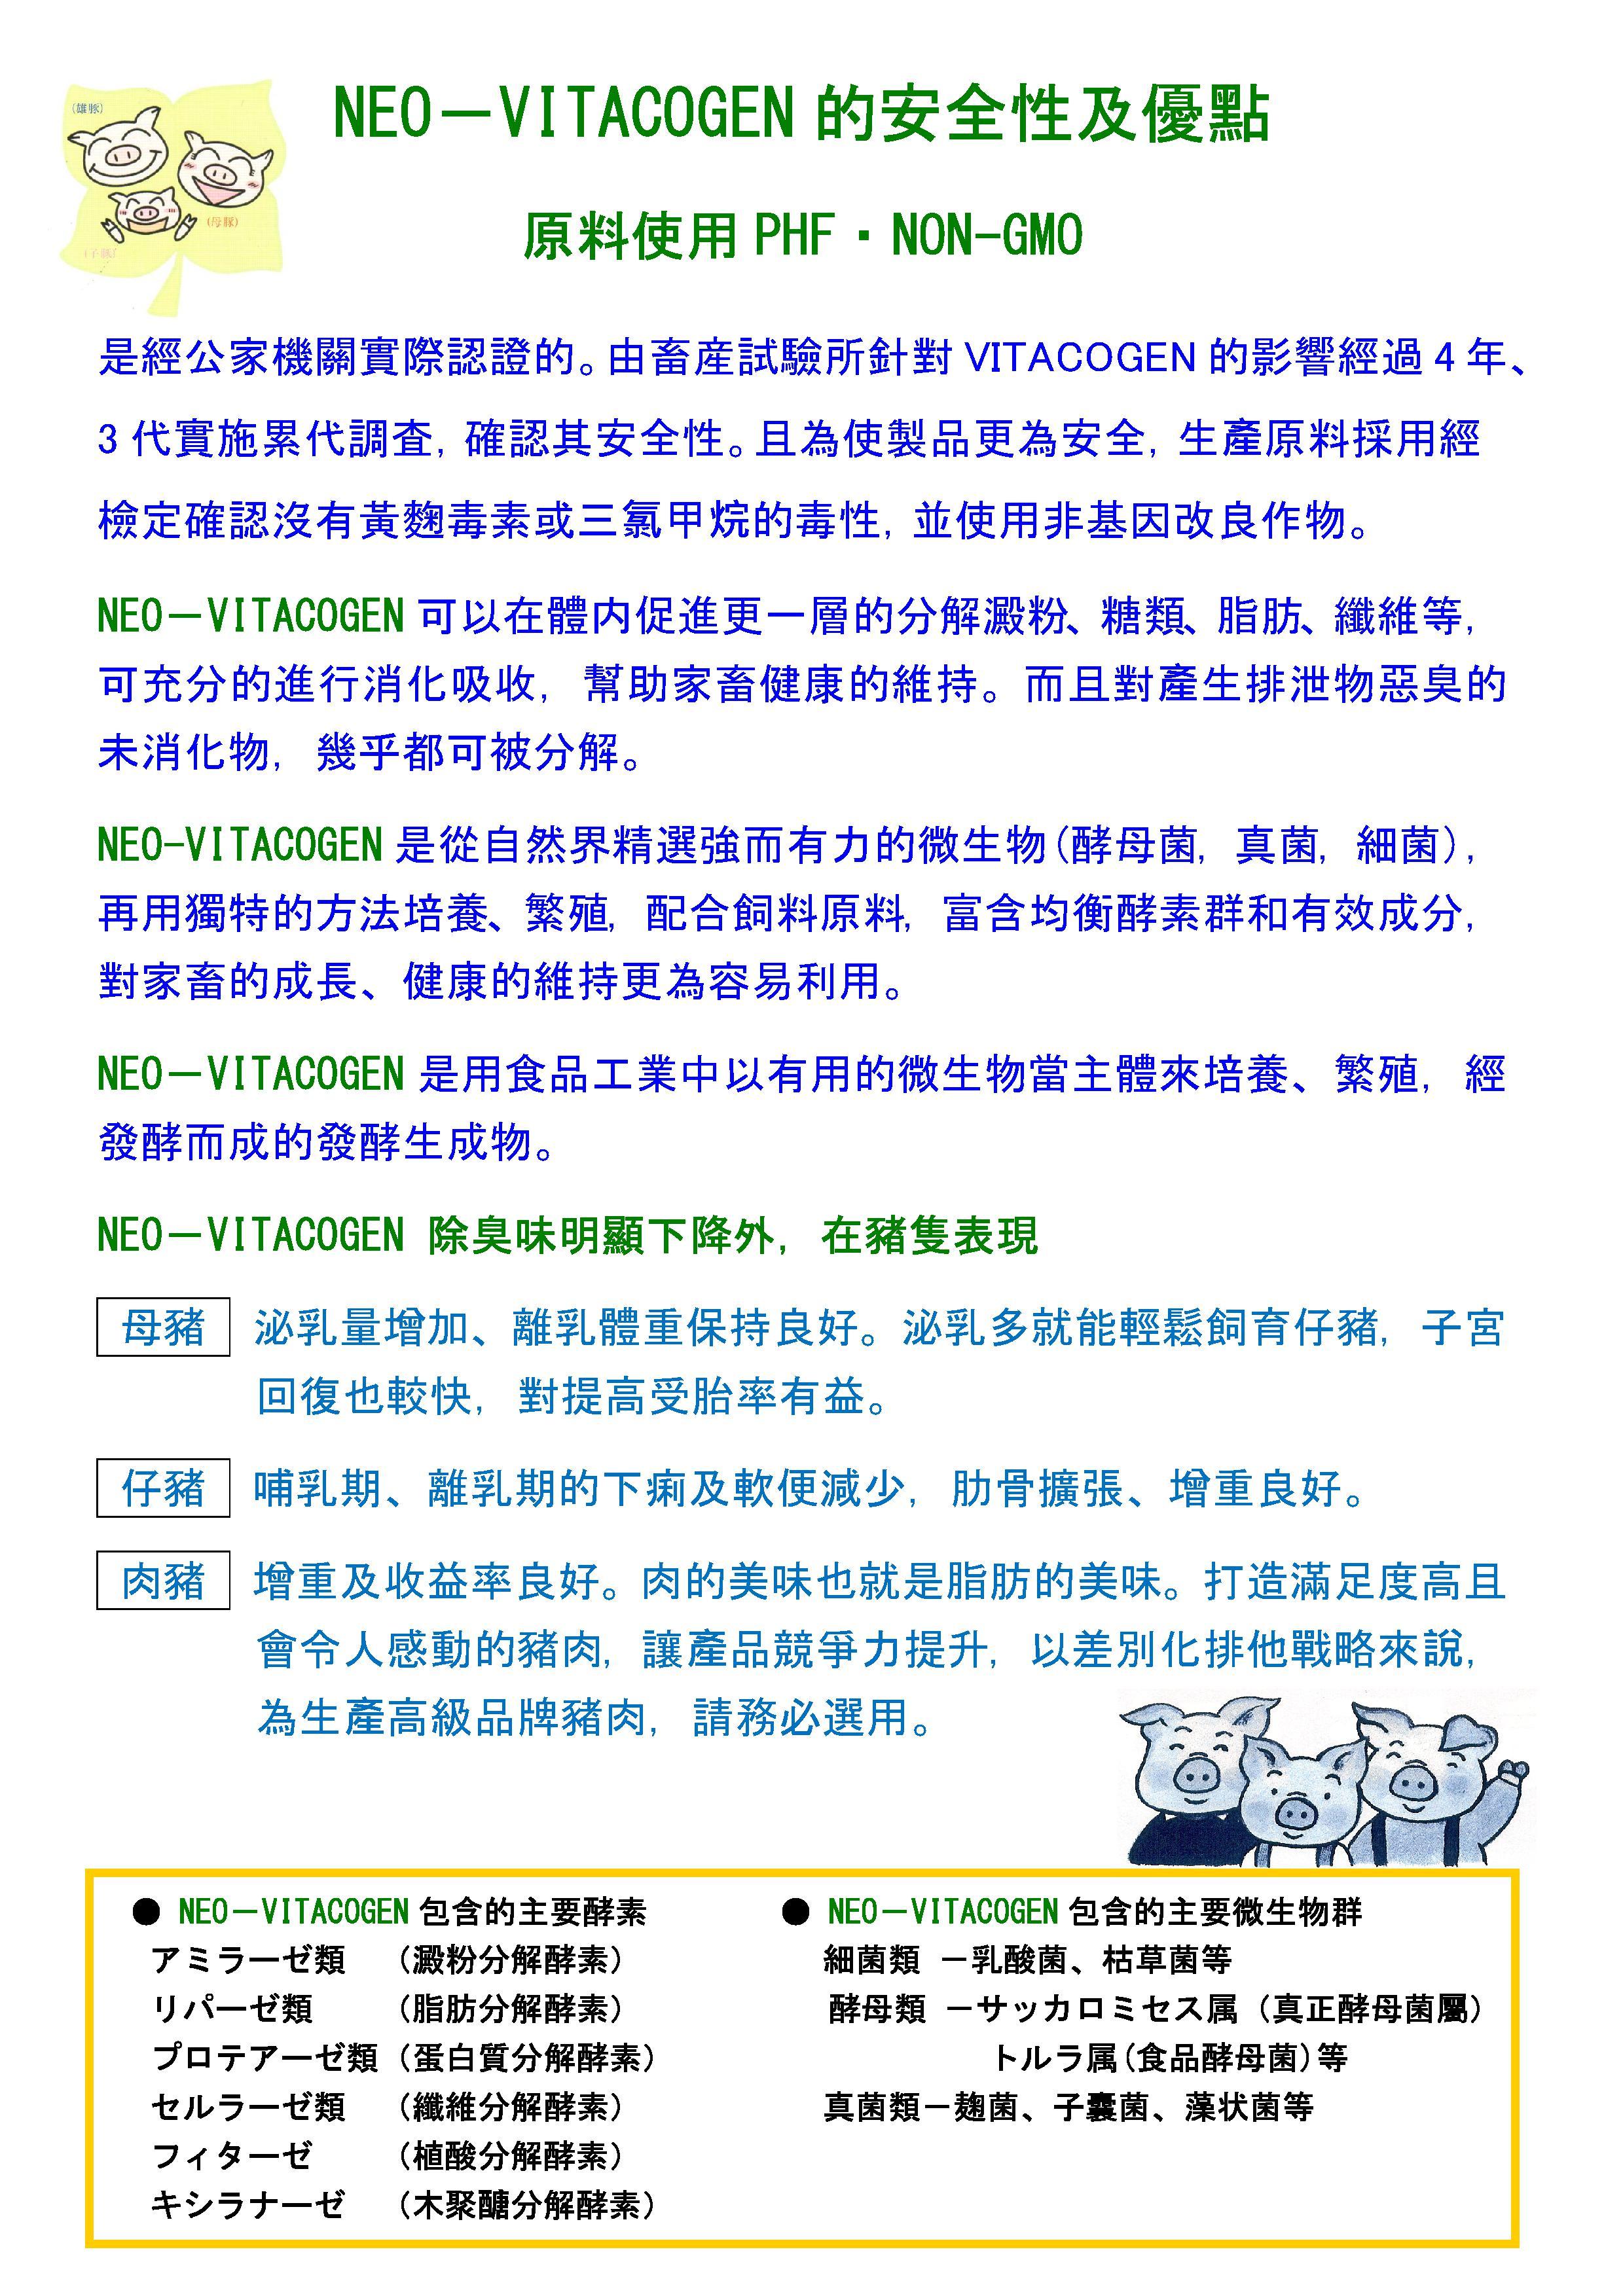 NEO+仔豬DM_20190125 (10)